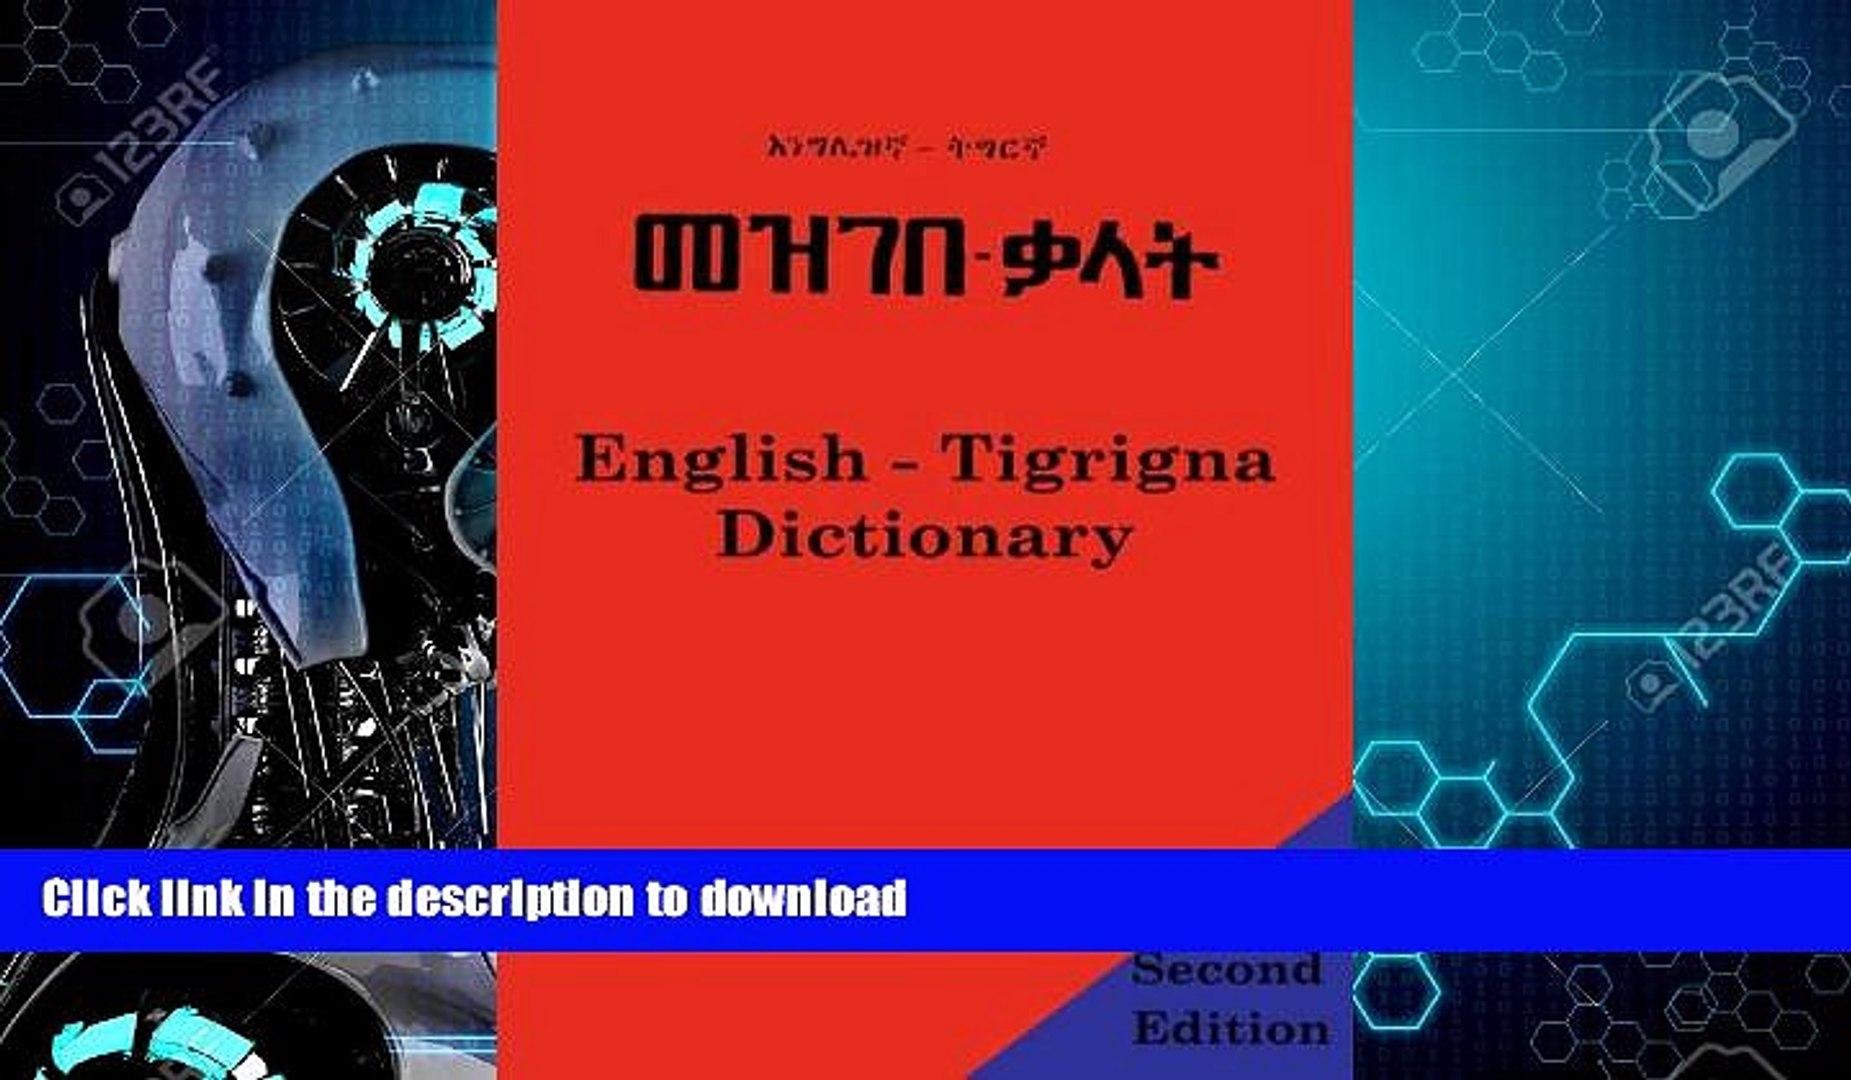 EBOOK ONLINE English - Tigrigna Dictionary GET PDF